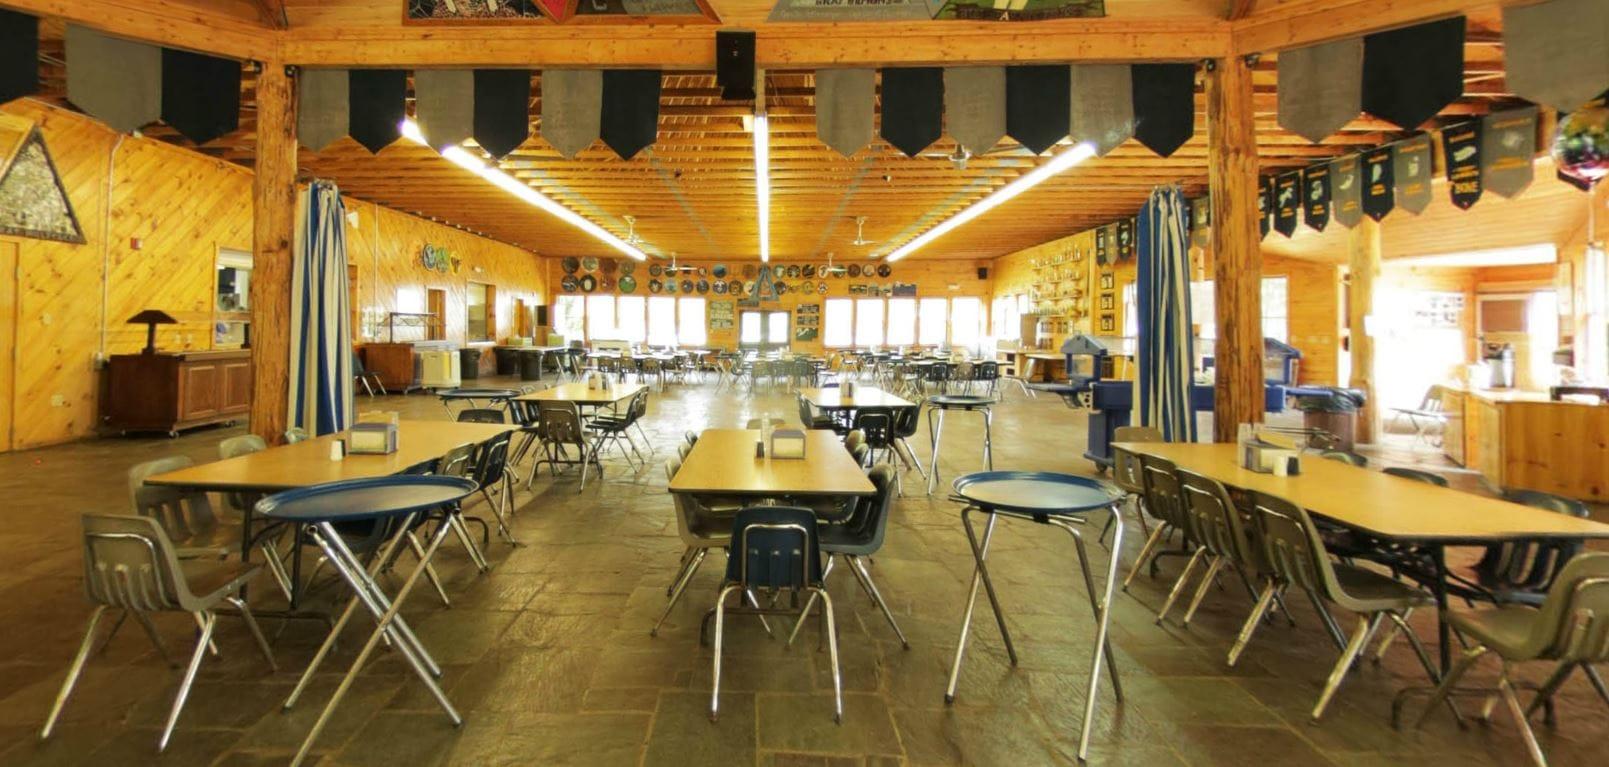 Dining hall warm